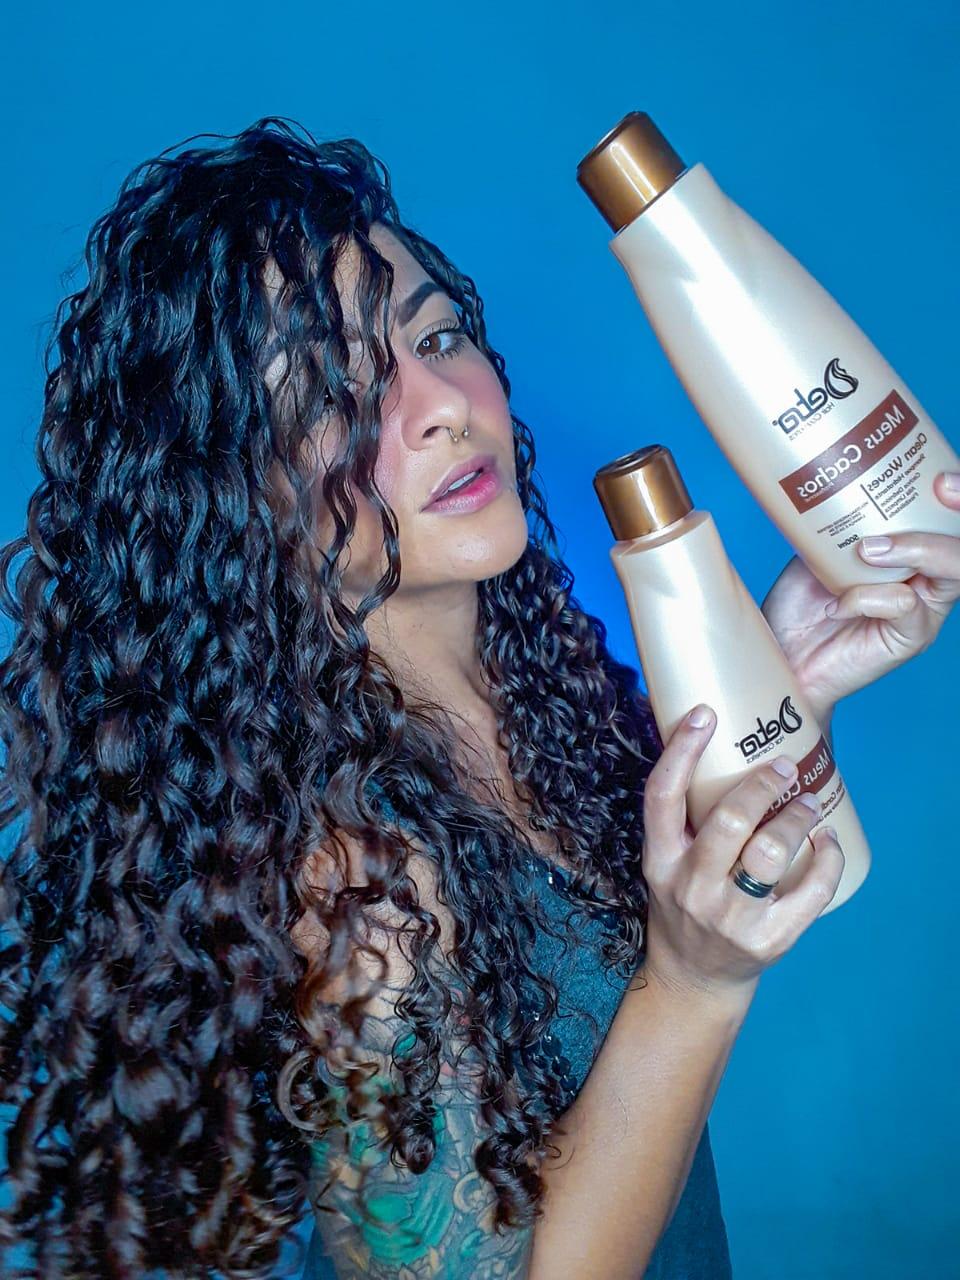 Shampoo Para Cabelos Cacheados Detra Hair Cosmeticos 500ml